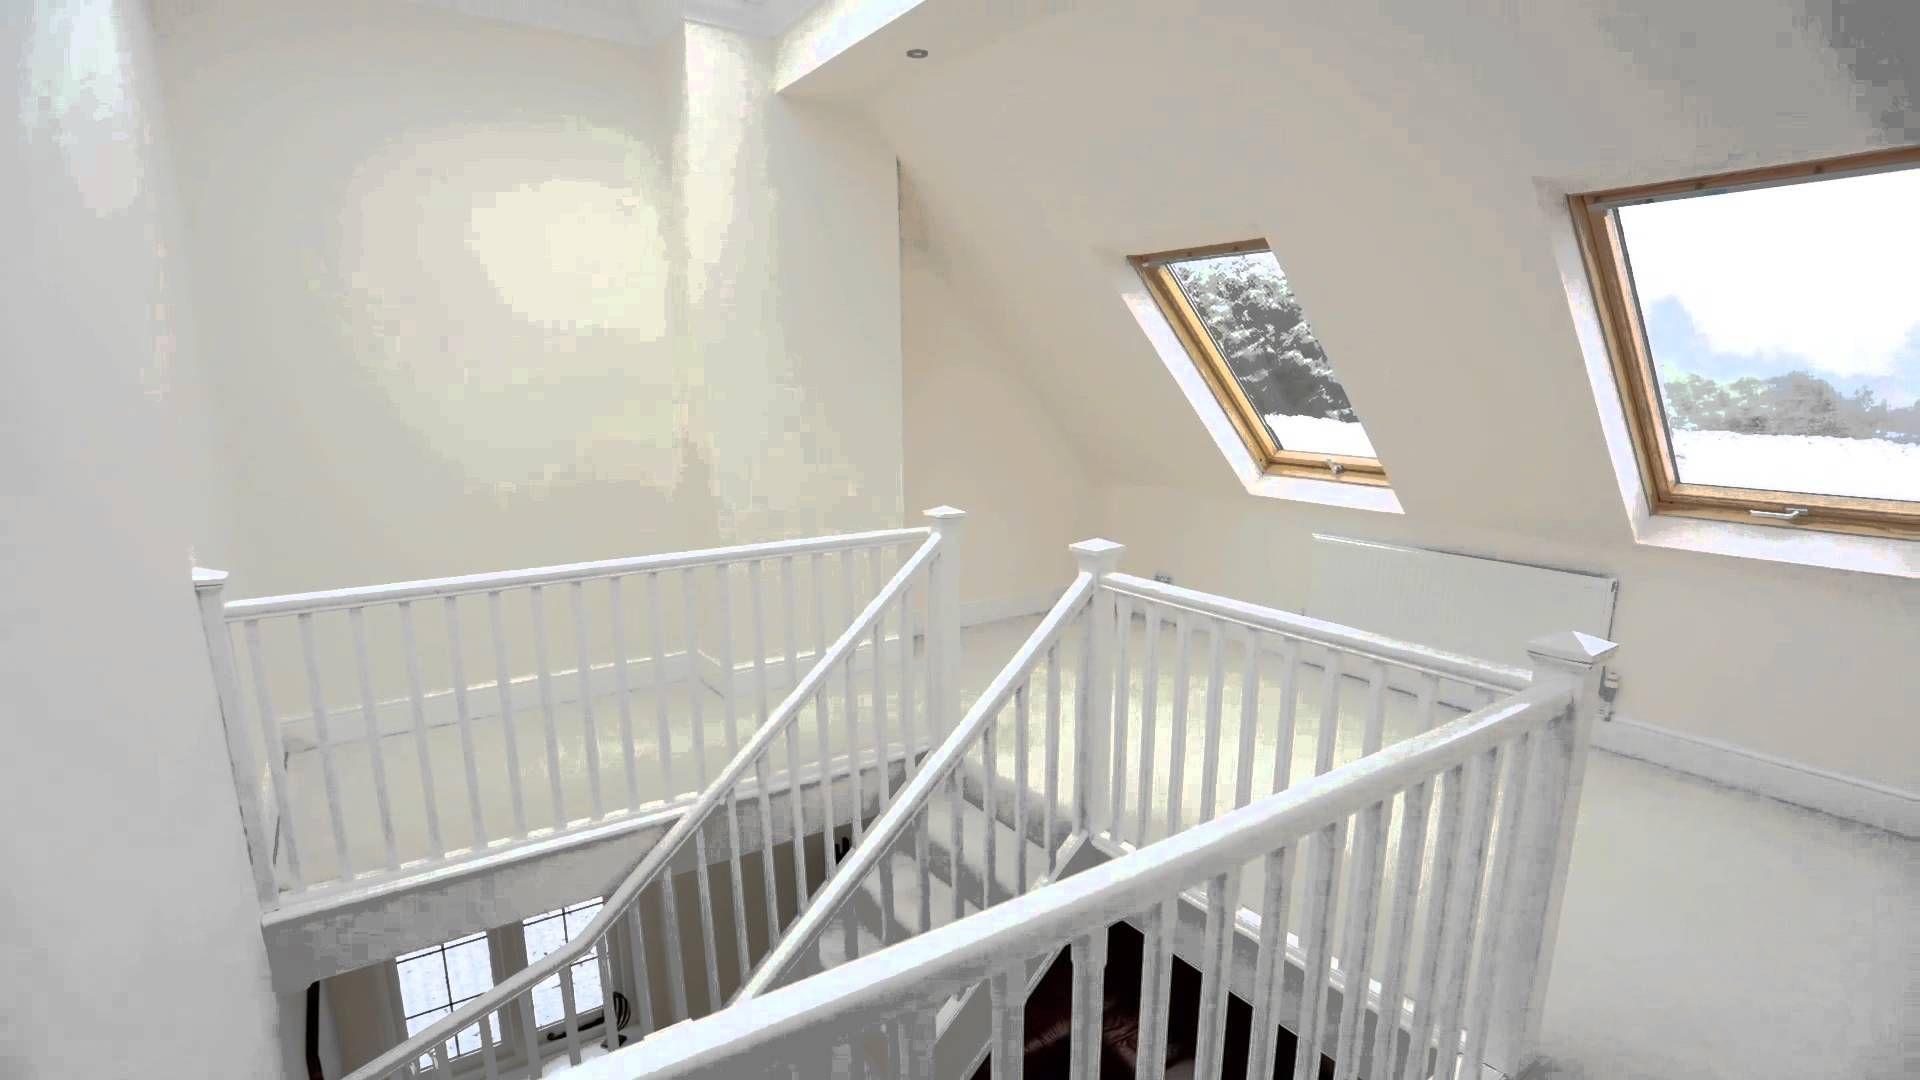 Loft bedroom regulations  UK Loft Building Regulations Intro video kitchendesignregulationsuk